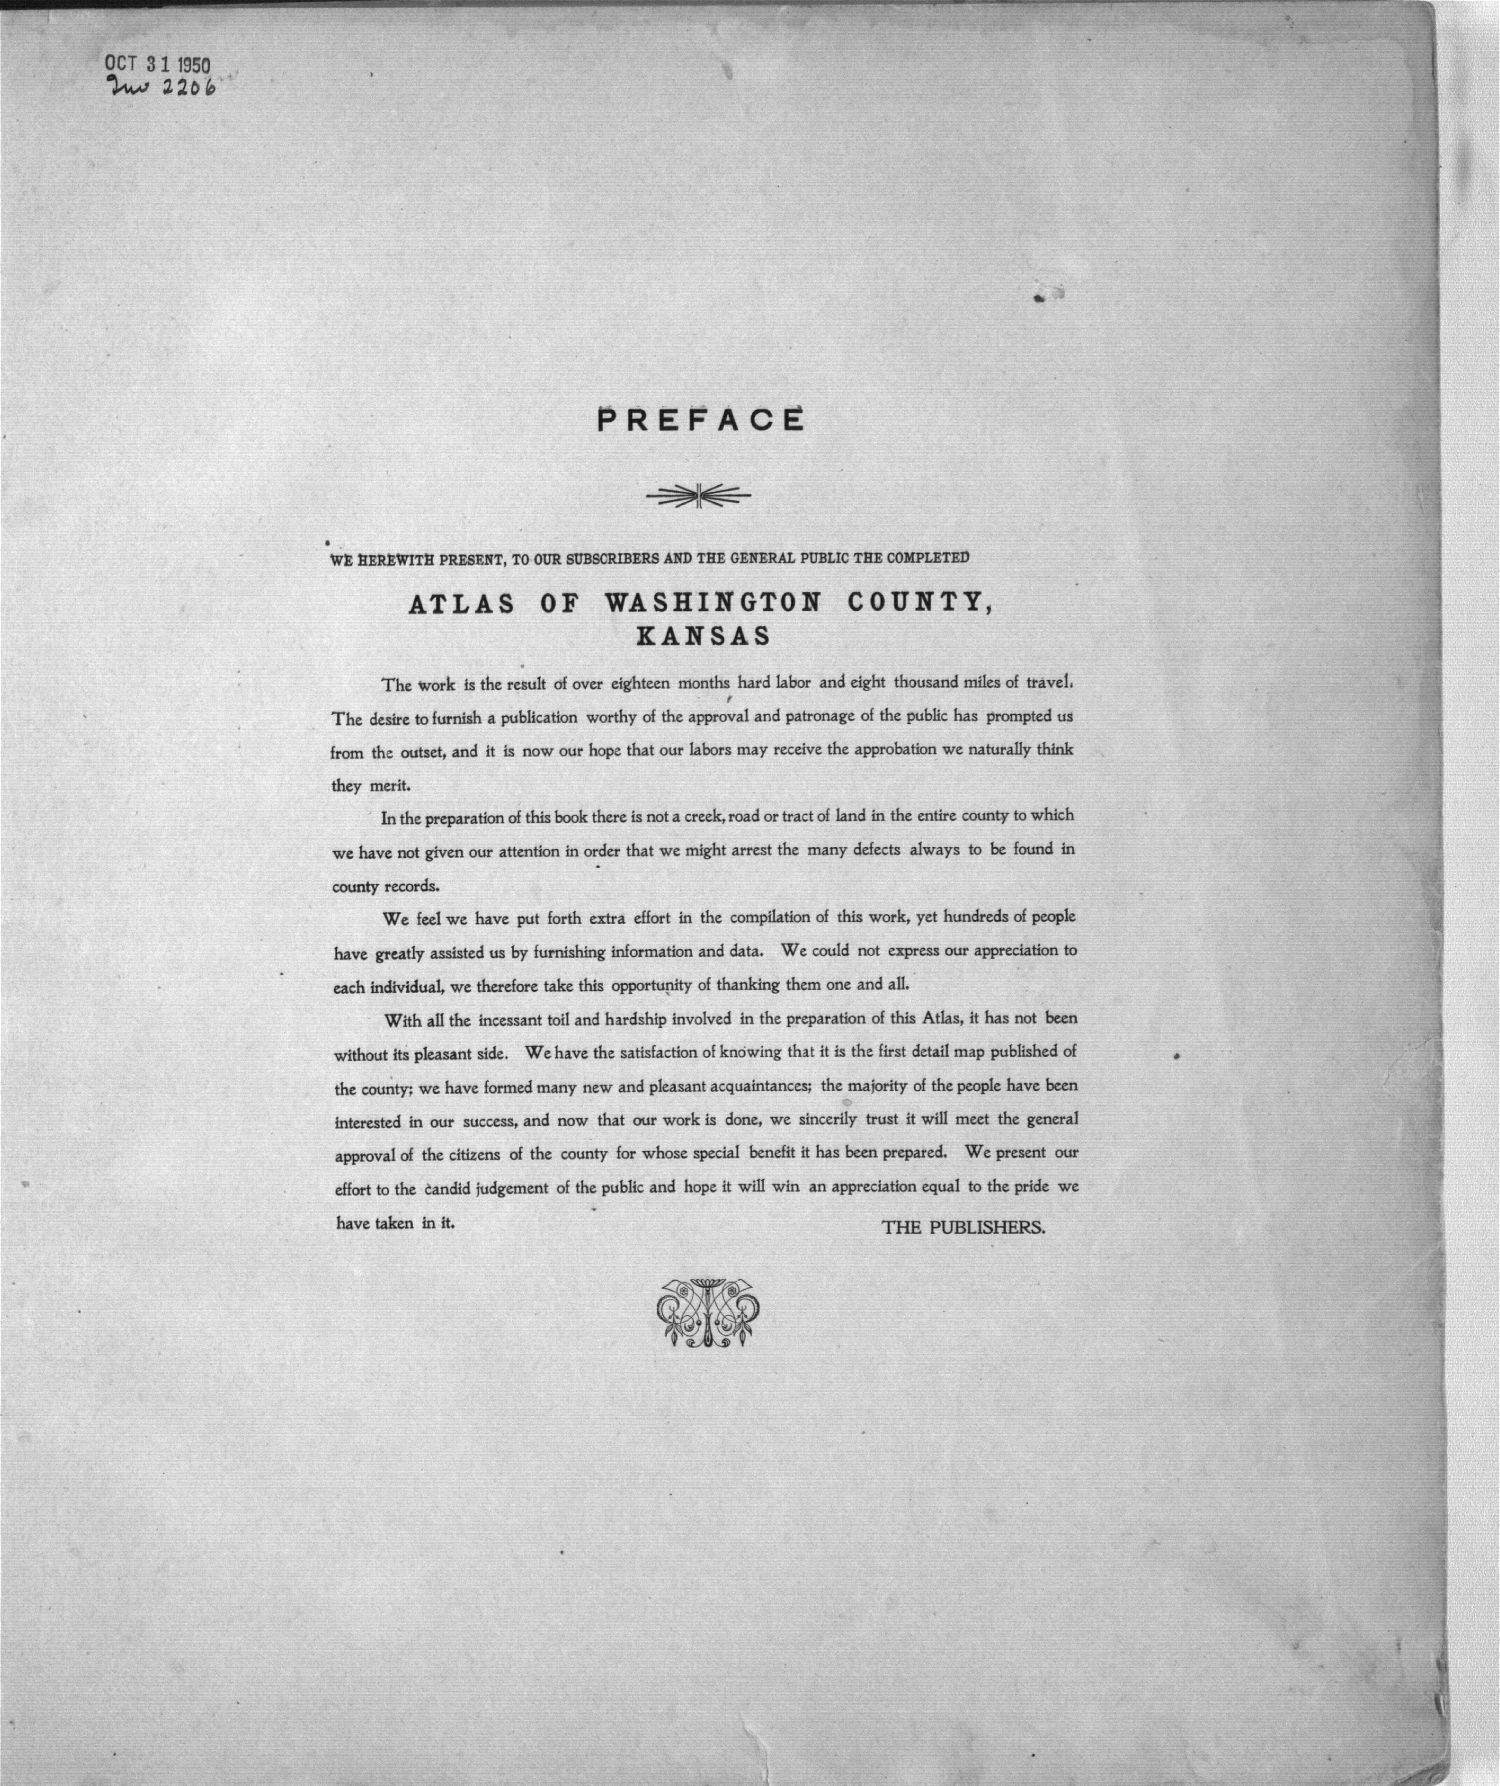 Plat book of Washington County, Kansas - Preface